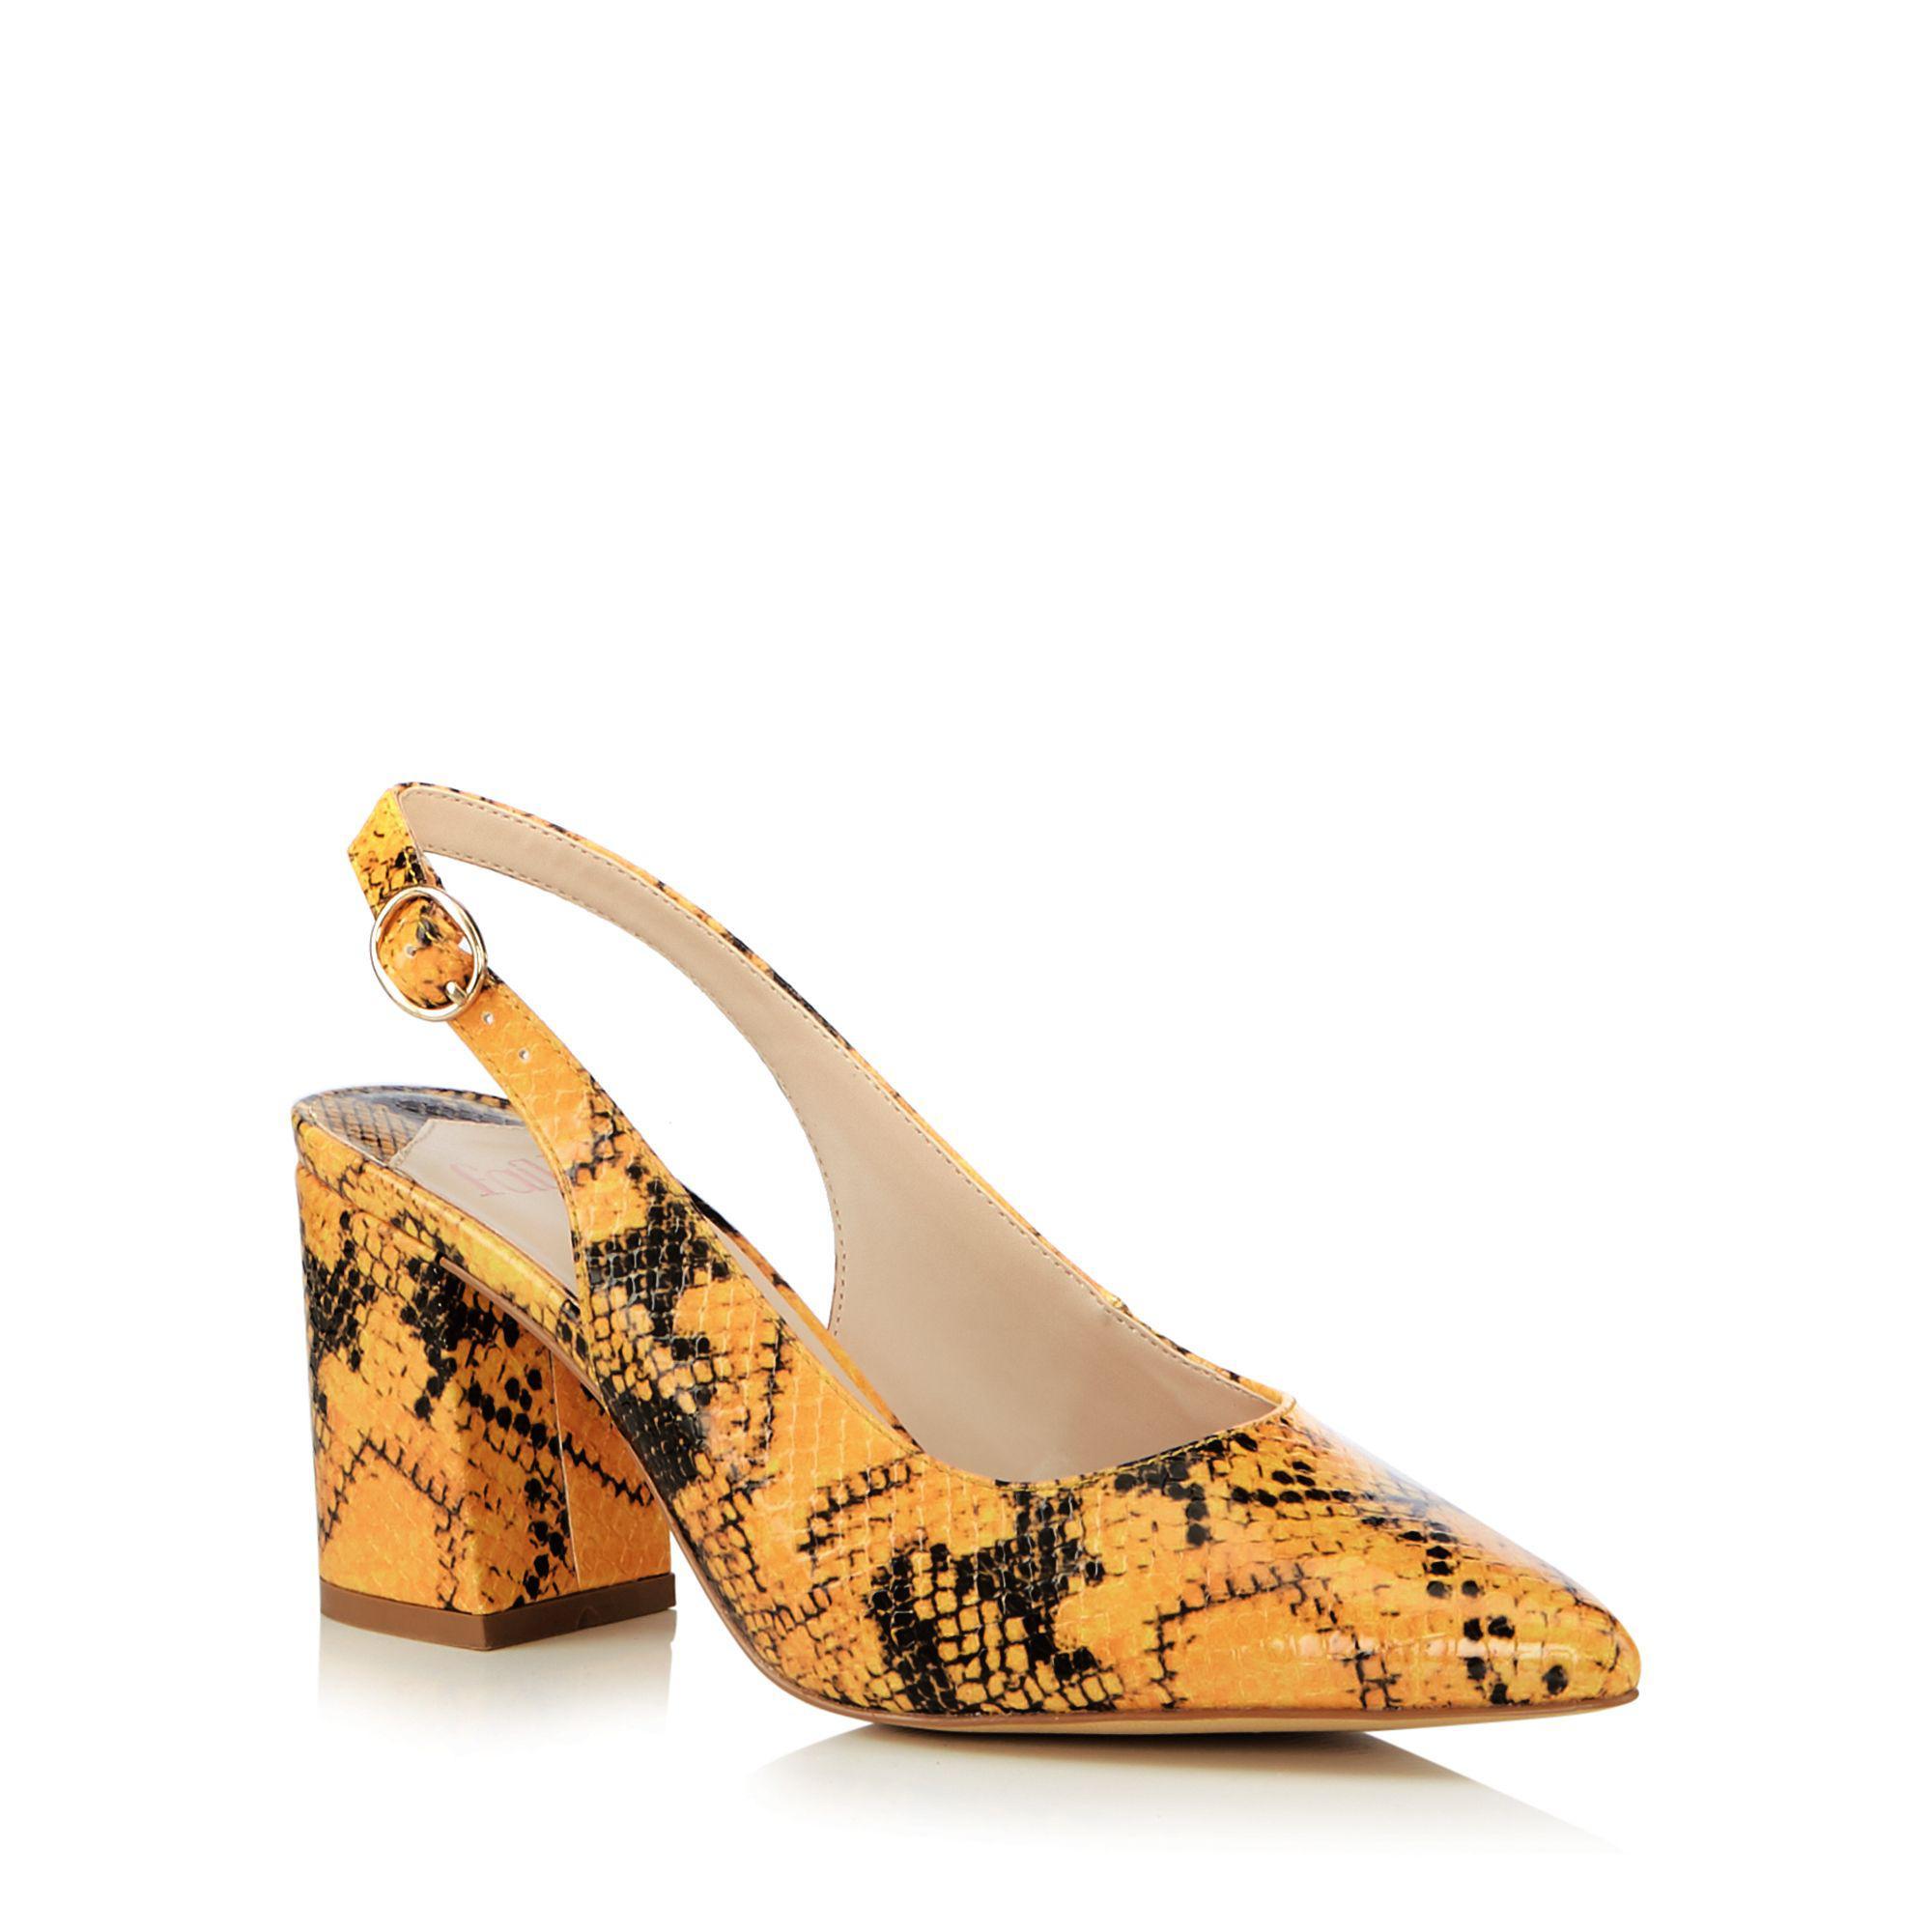 4a8efc5538b0 Faith Yellow  cake  Snakeskin Block Heel Slingbacks Sandals in ...